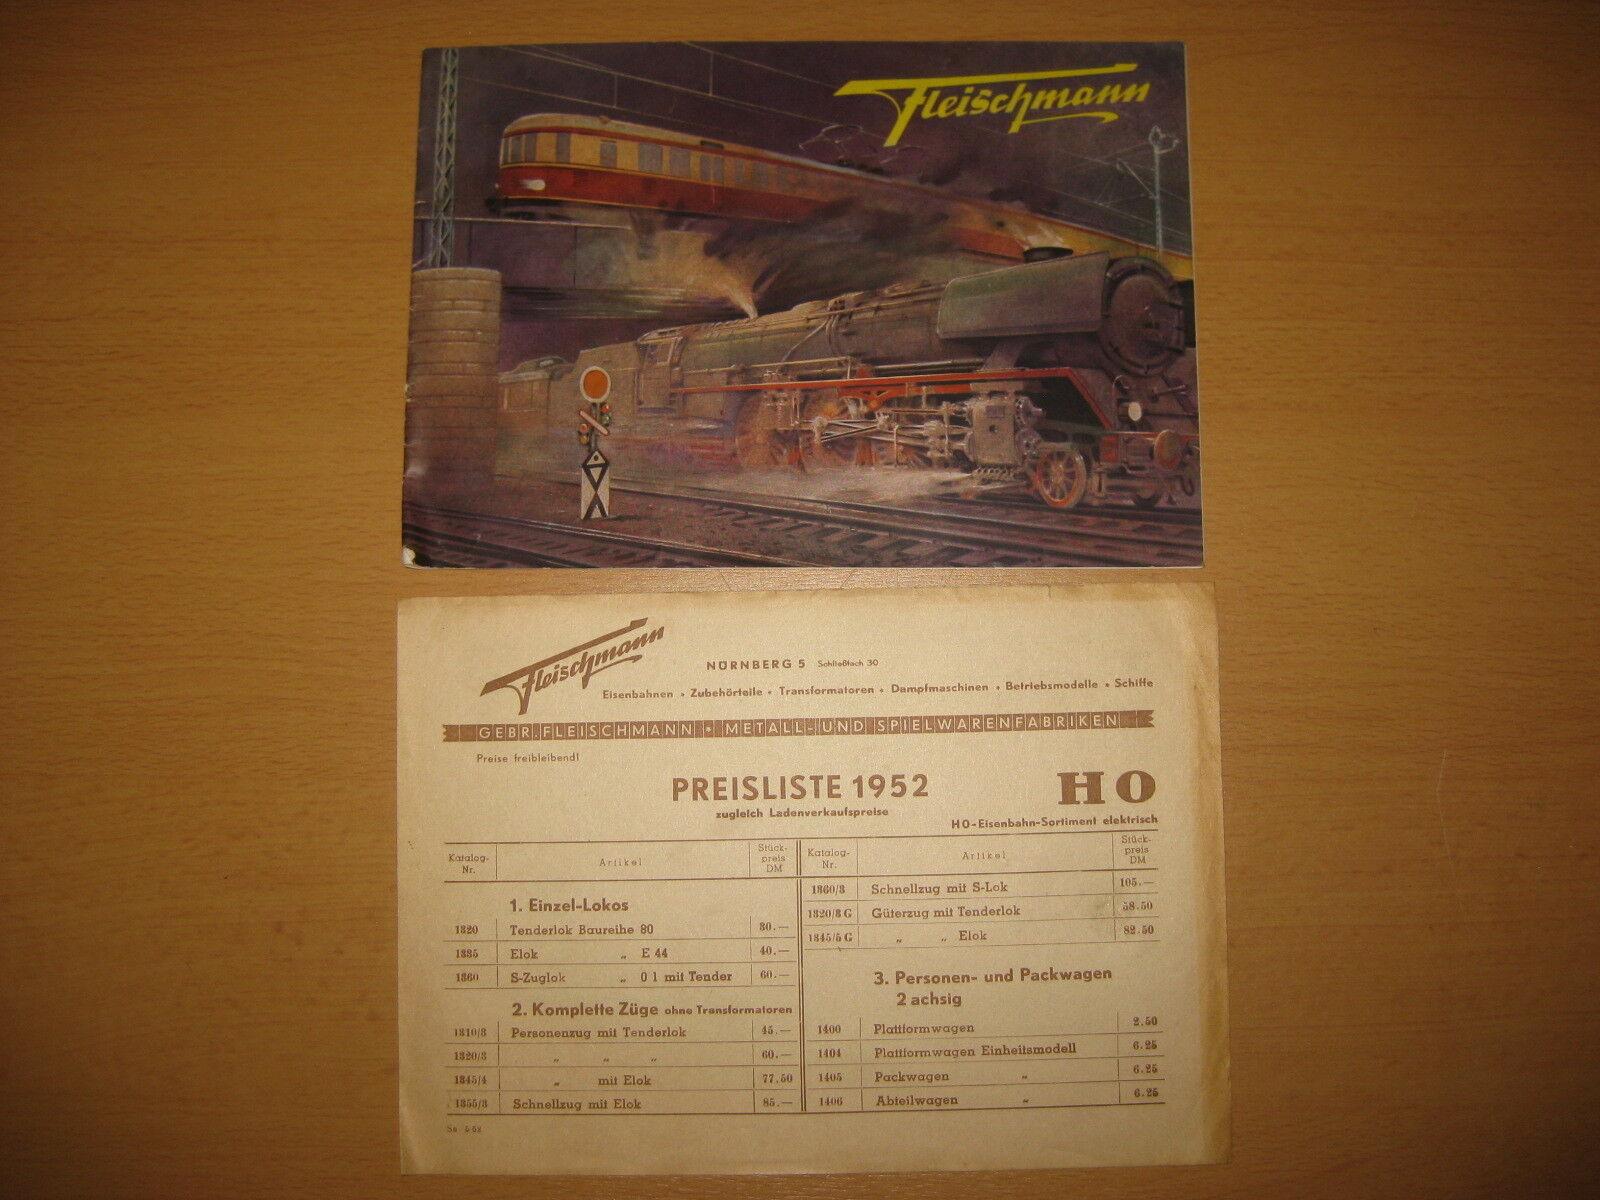 Fleischmann CATALOGO CON LISTINO PREZZI 1952/r569